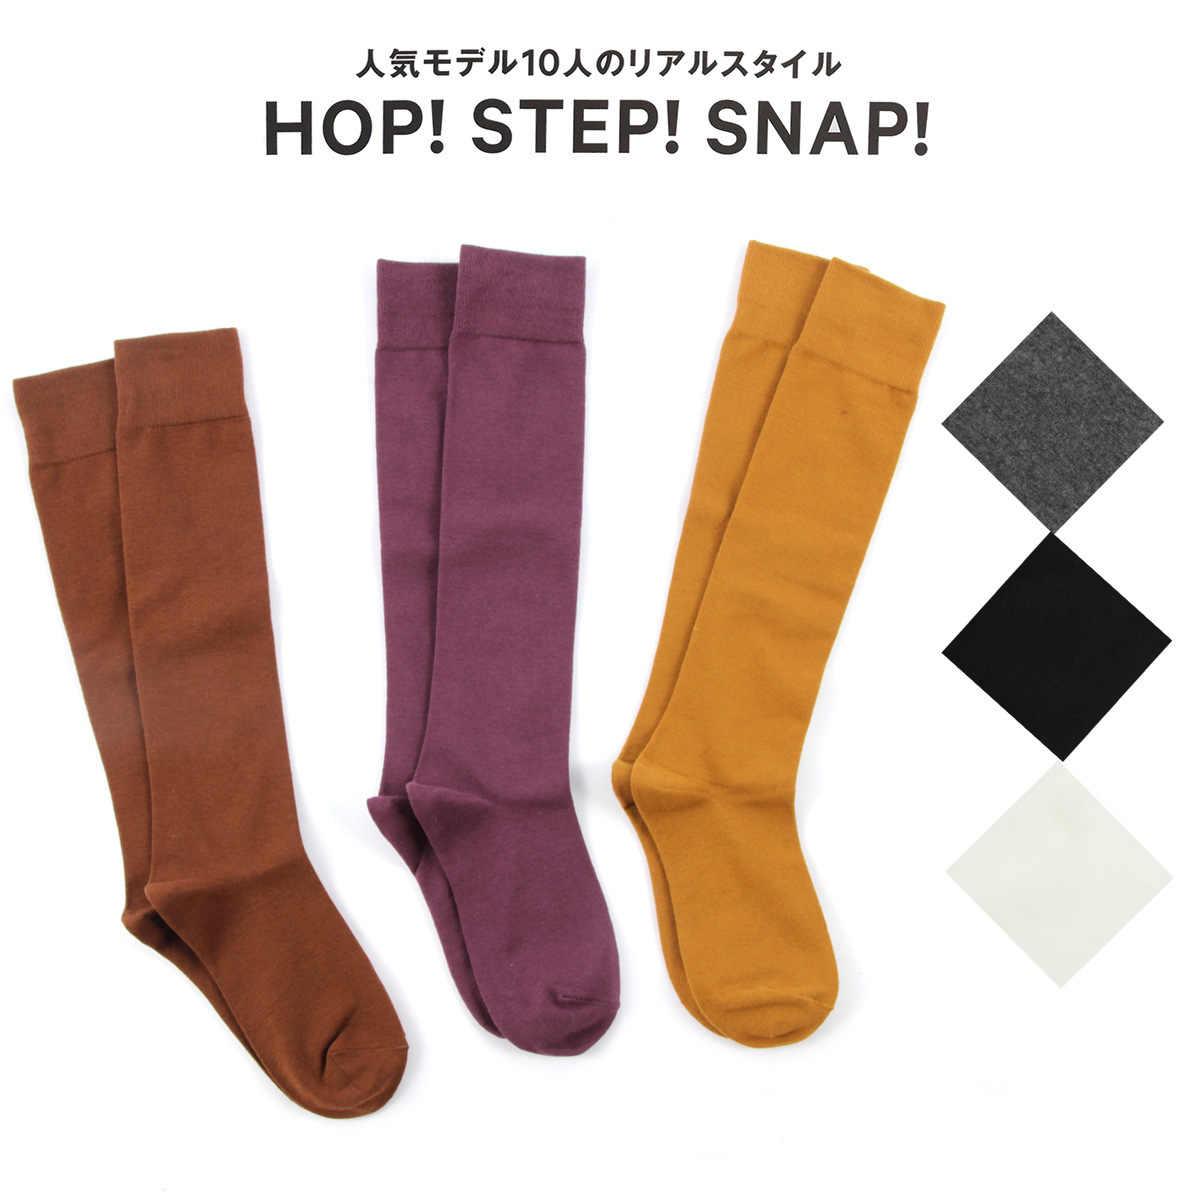 9ab5fa6d3 ... 2019 Fashion Women Stockings Warm Thigh High Knee Funny Cute Socks  School Girls Japanese Long Cotton